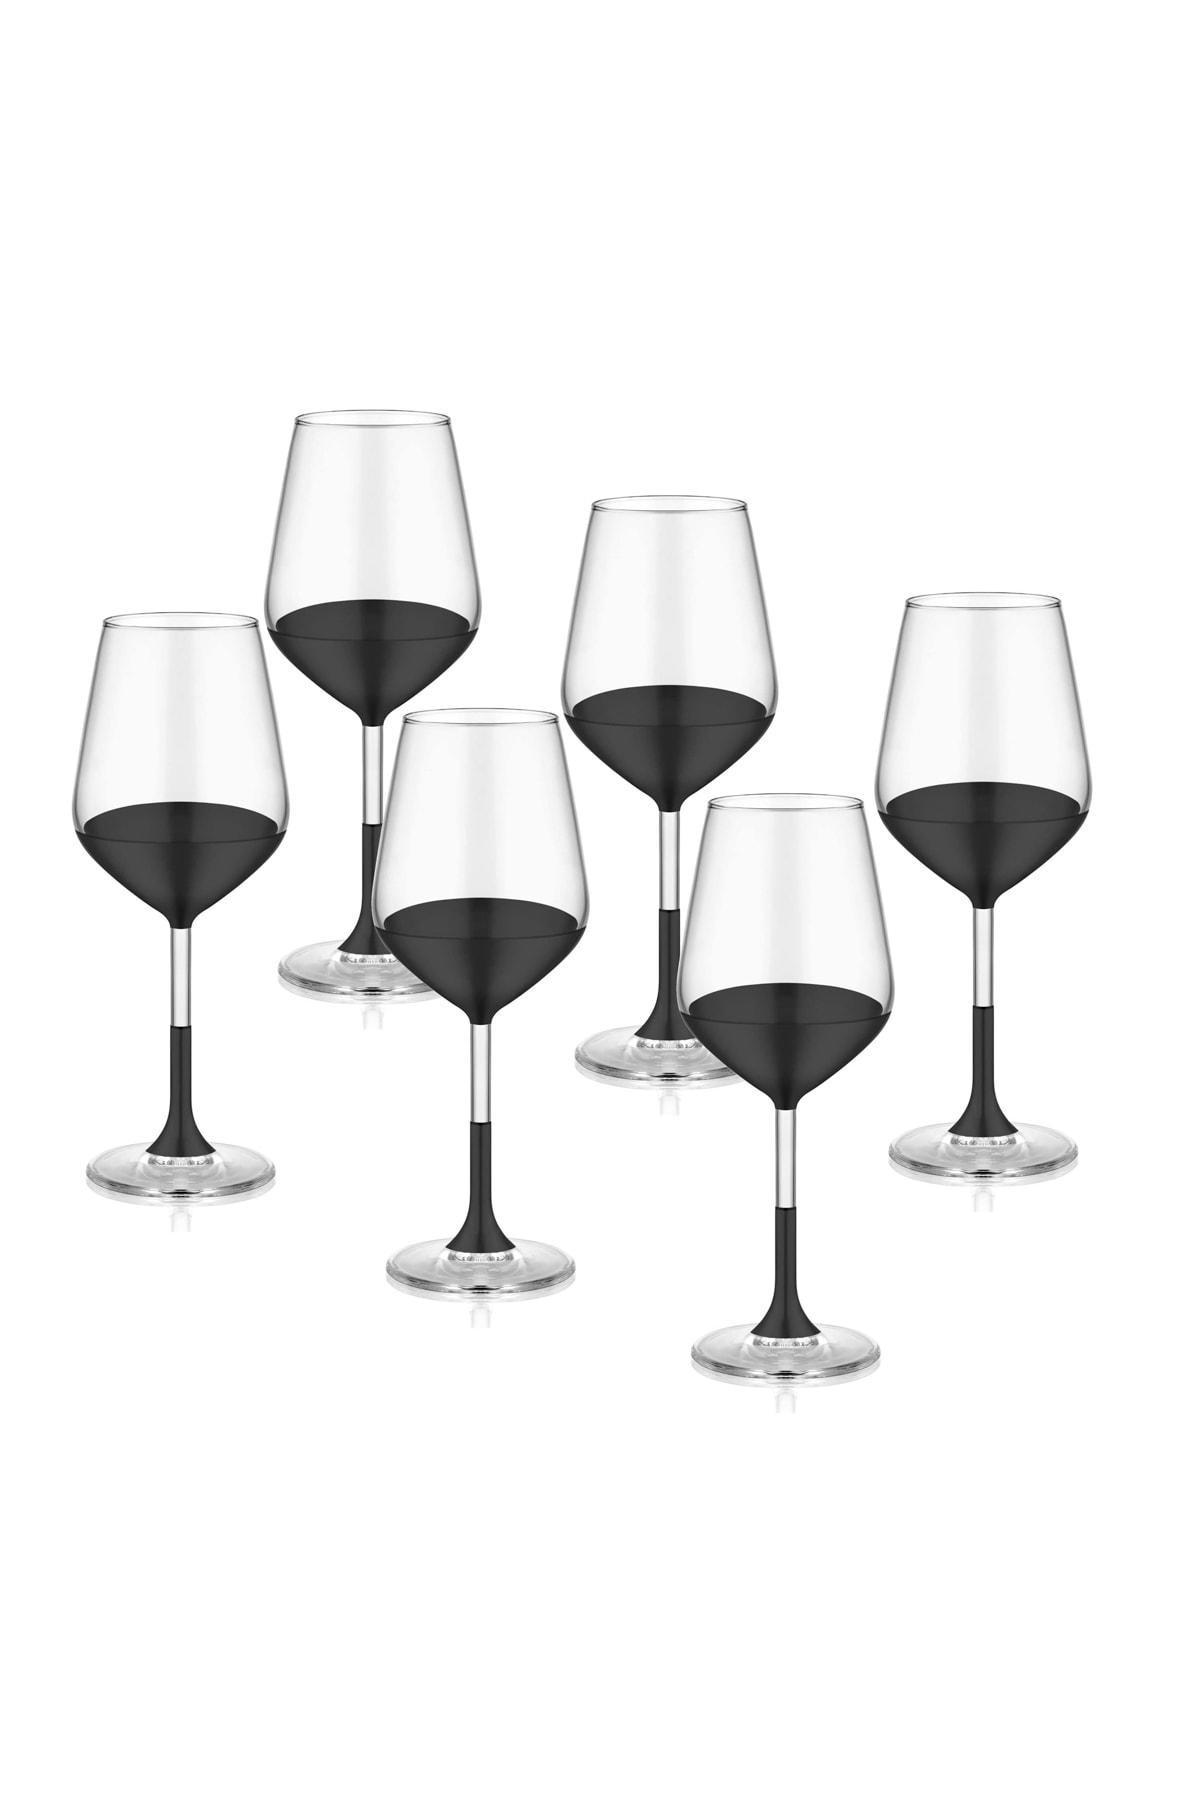 The Mia Dark Şarap Kadehi 6'lı Set 1